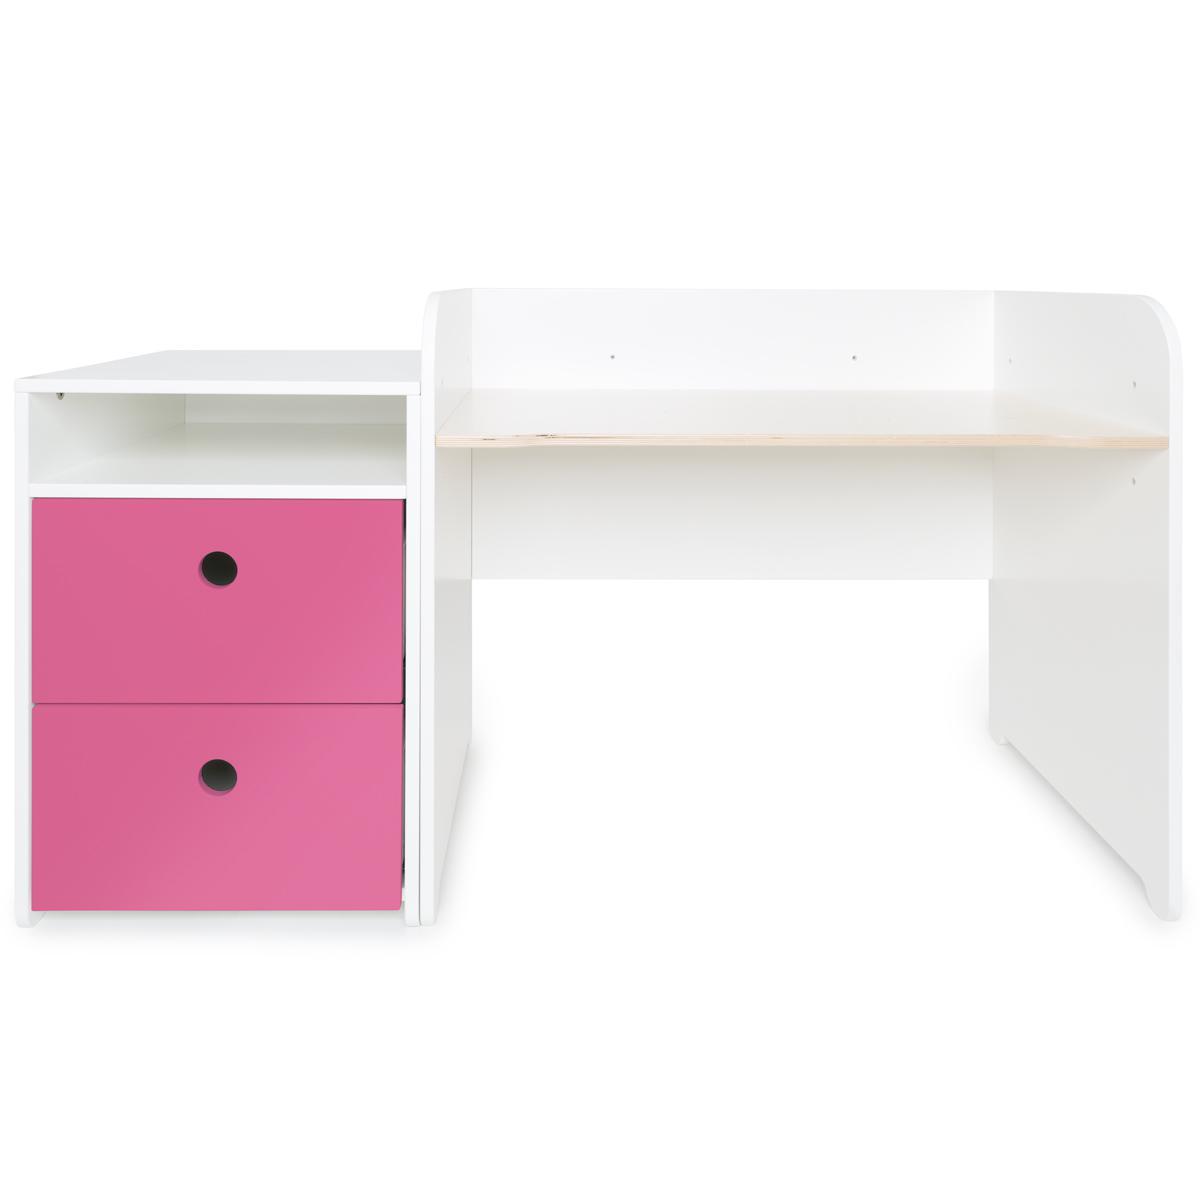 Bureau évolutif-petit meuble 2 tiroirs COLORFLEX pink